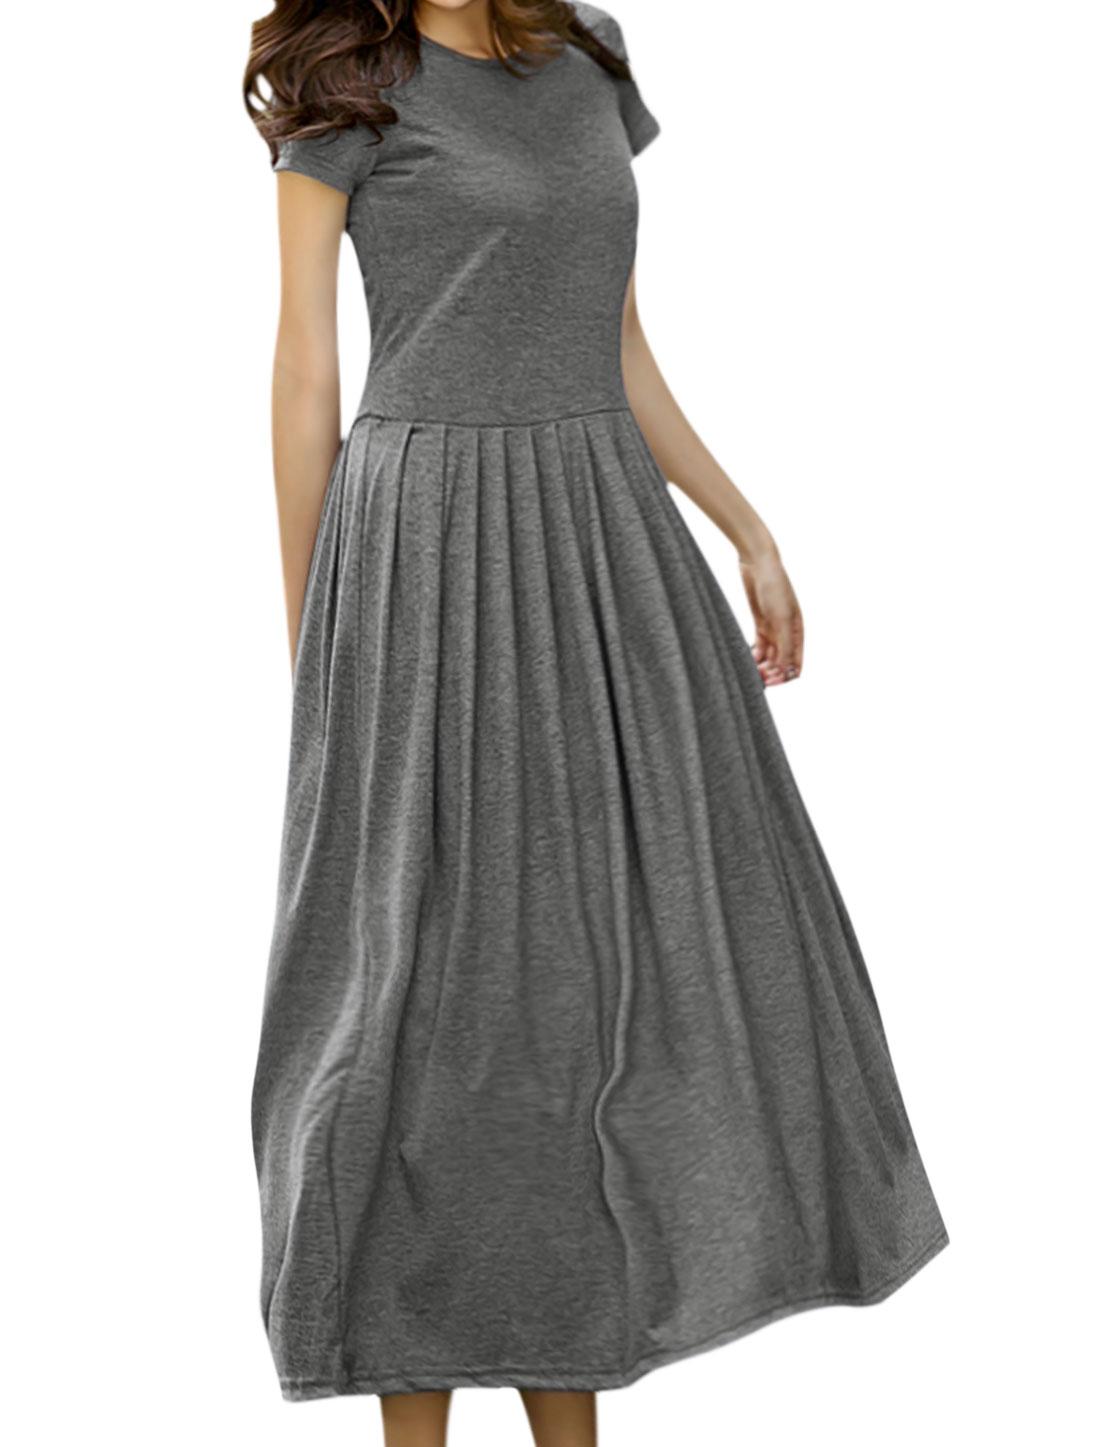 Women Round Neck Short Sleeves Pleated Maxi Dress Gray M